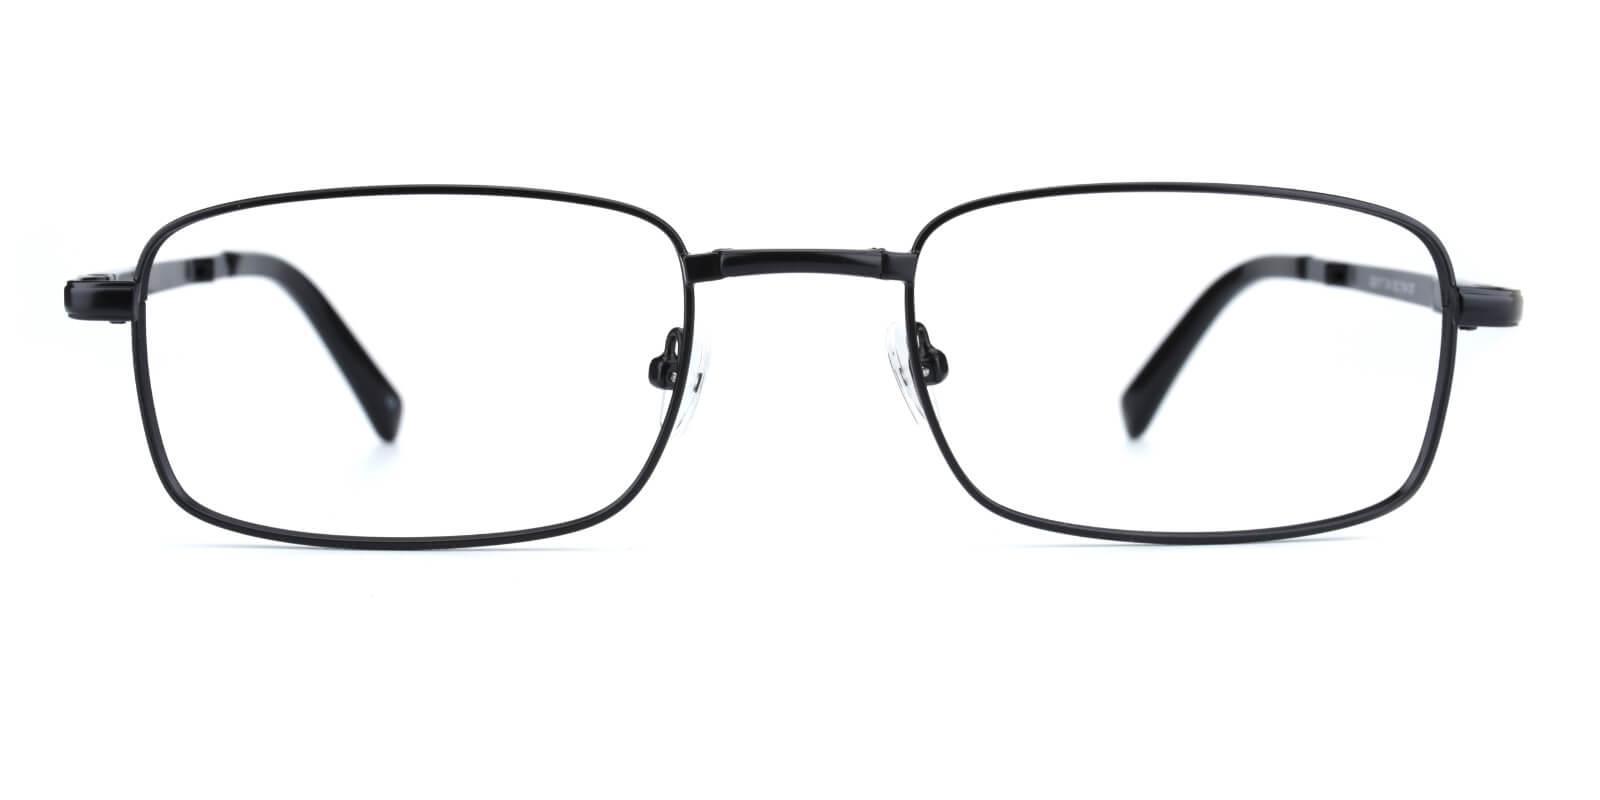 Norfolk-Black-Rectangle-Metal-Eyeglasses-additional2